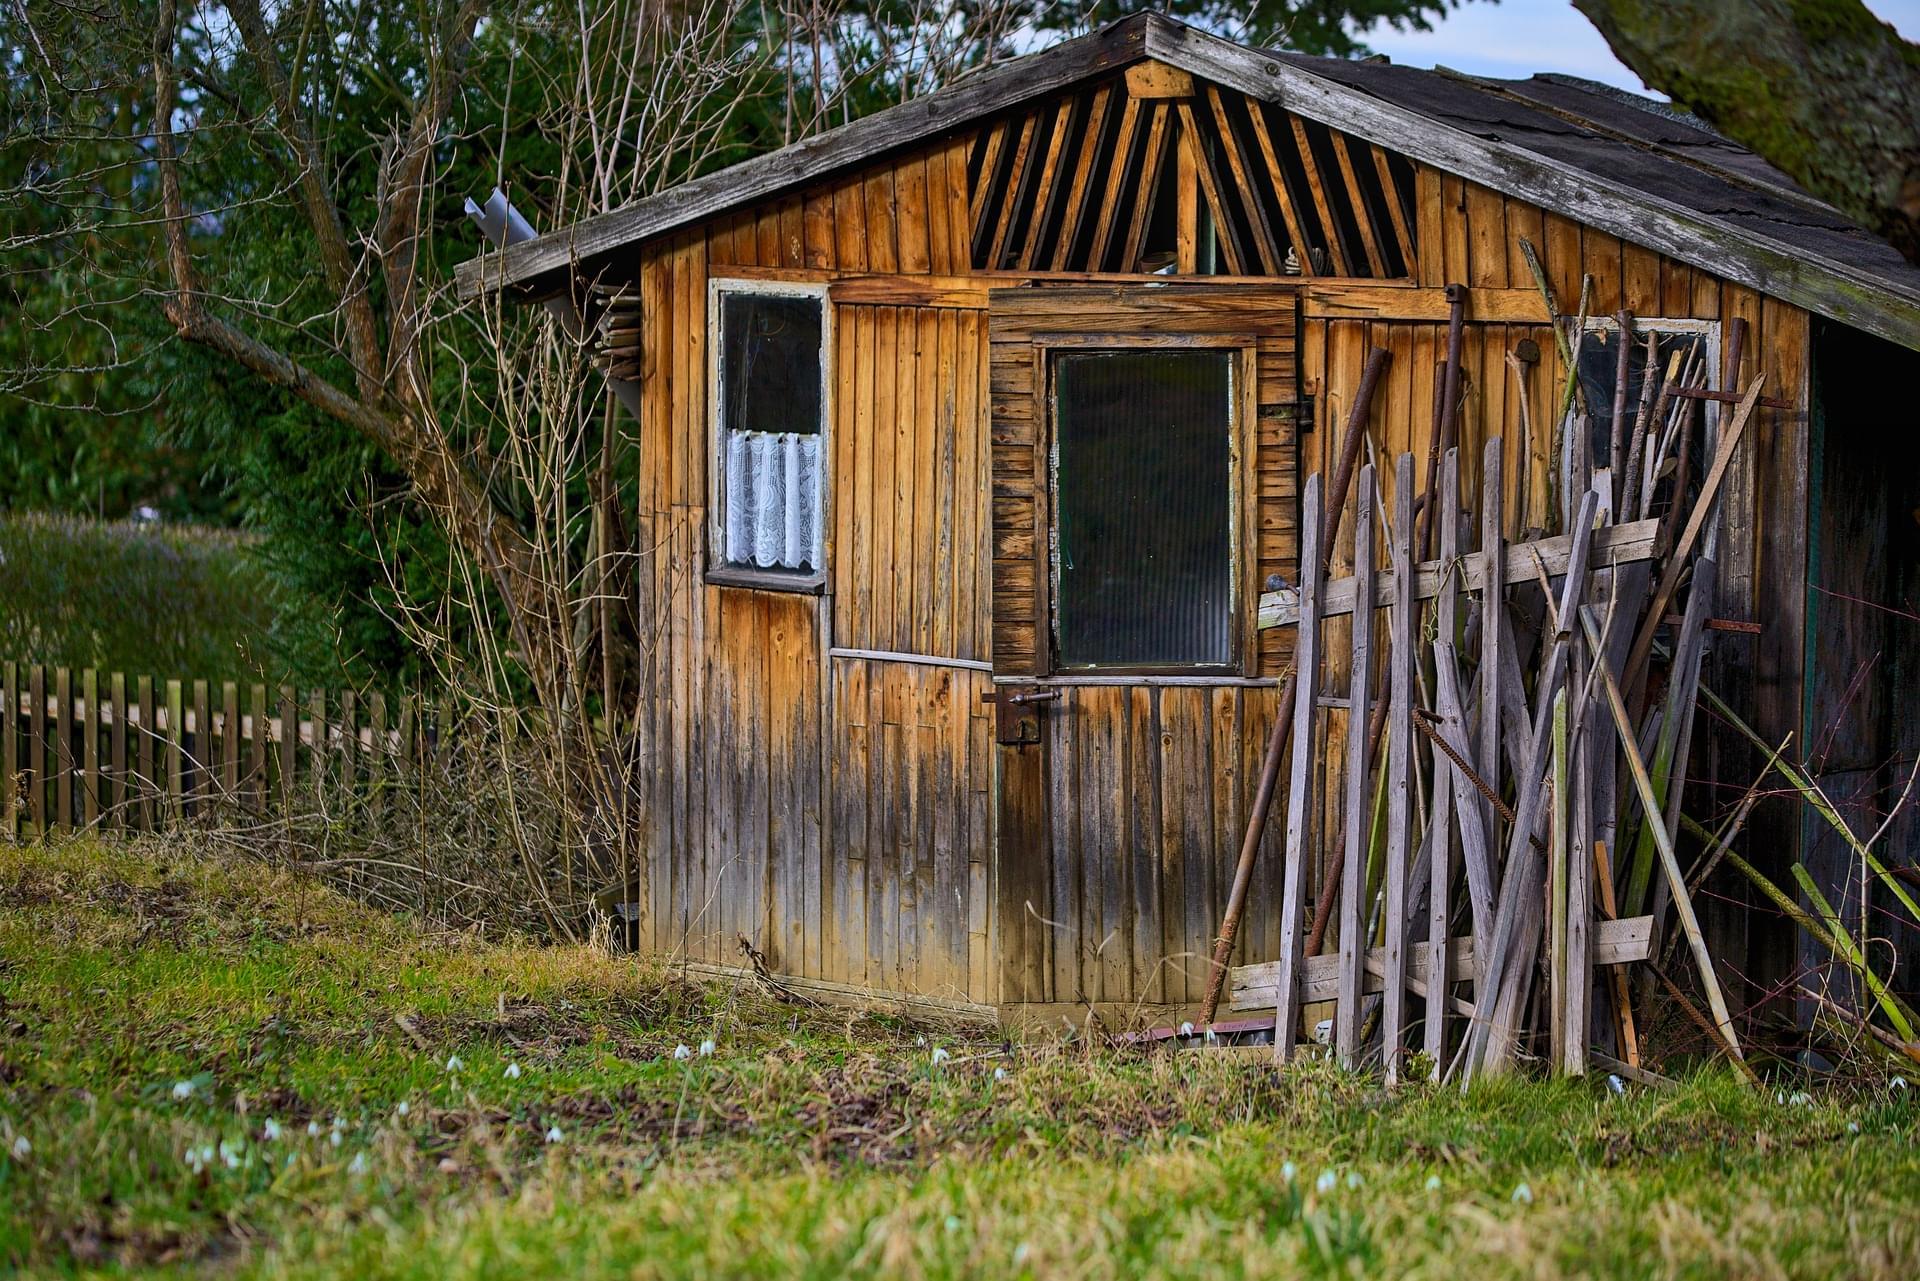 Construire Abri De Jardin construire un abri de jardin | conseils et mise en place